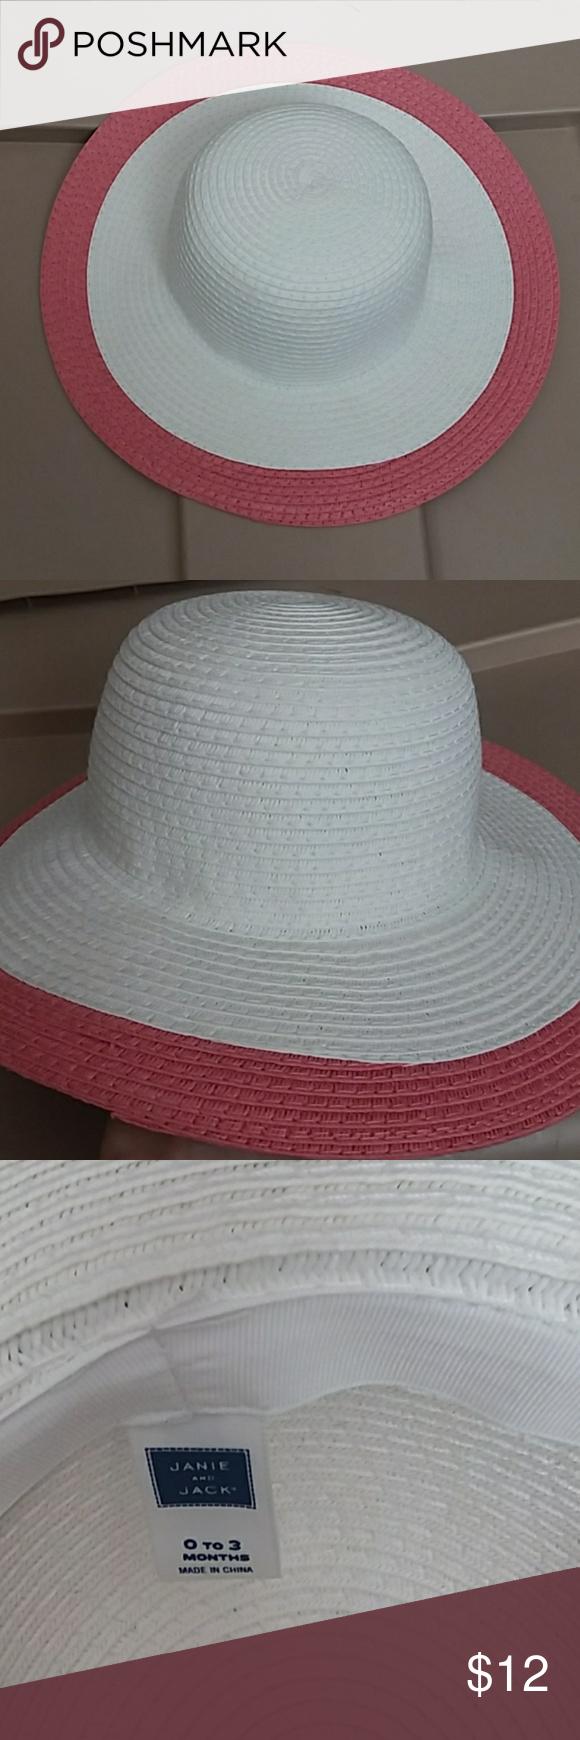 Janie And Jack Pink And White Straw Hat Janie And Jack Pink Straw Hat